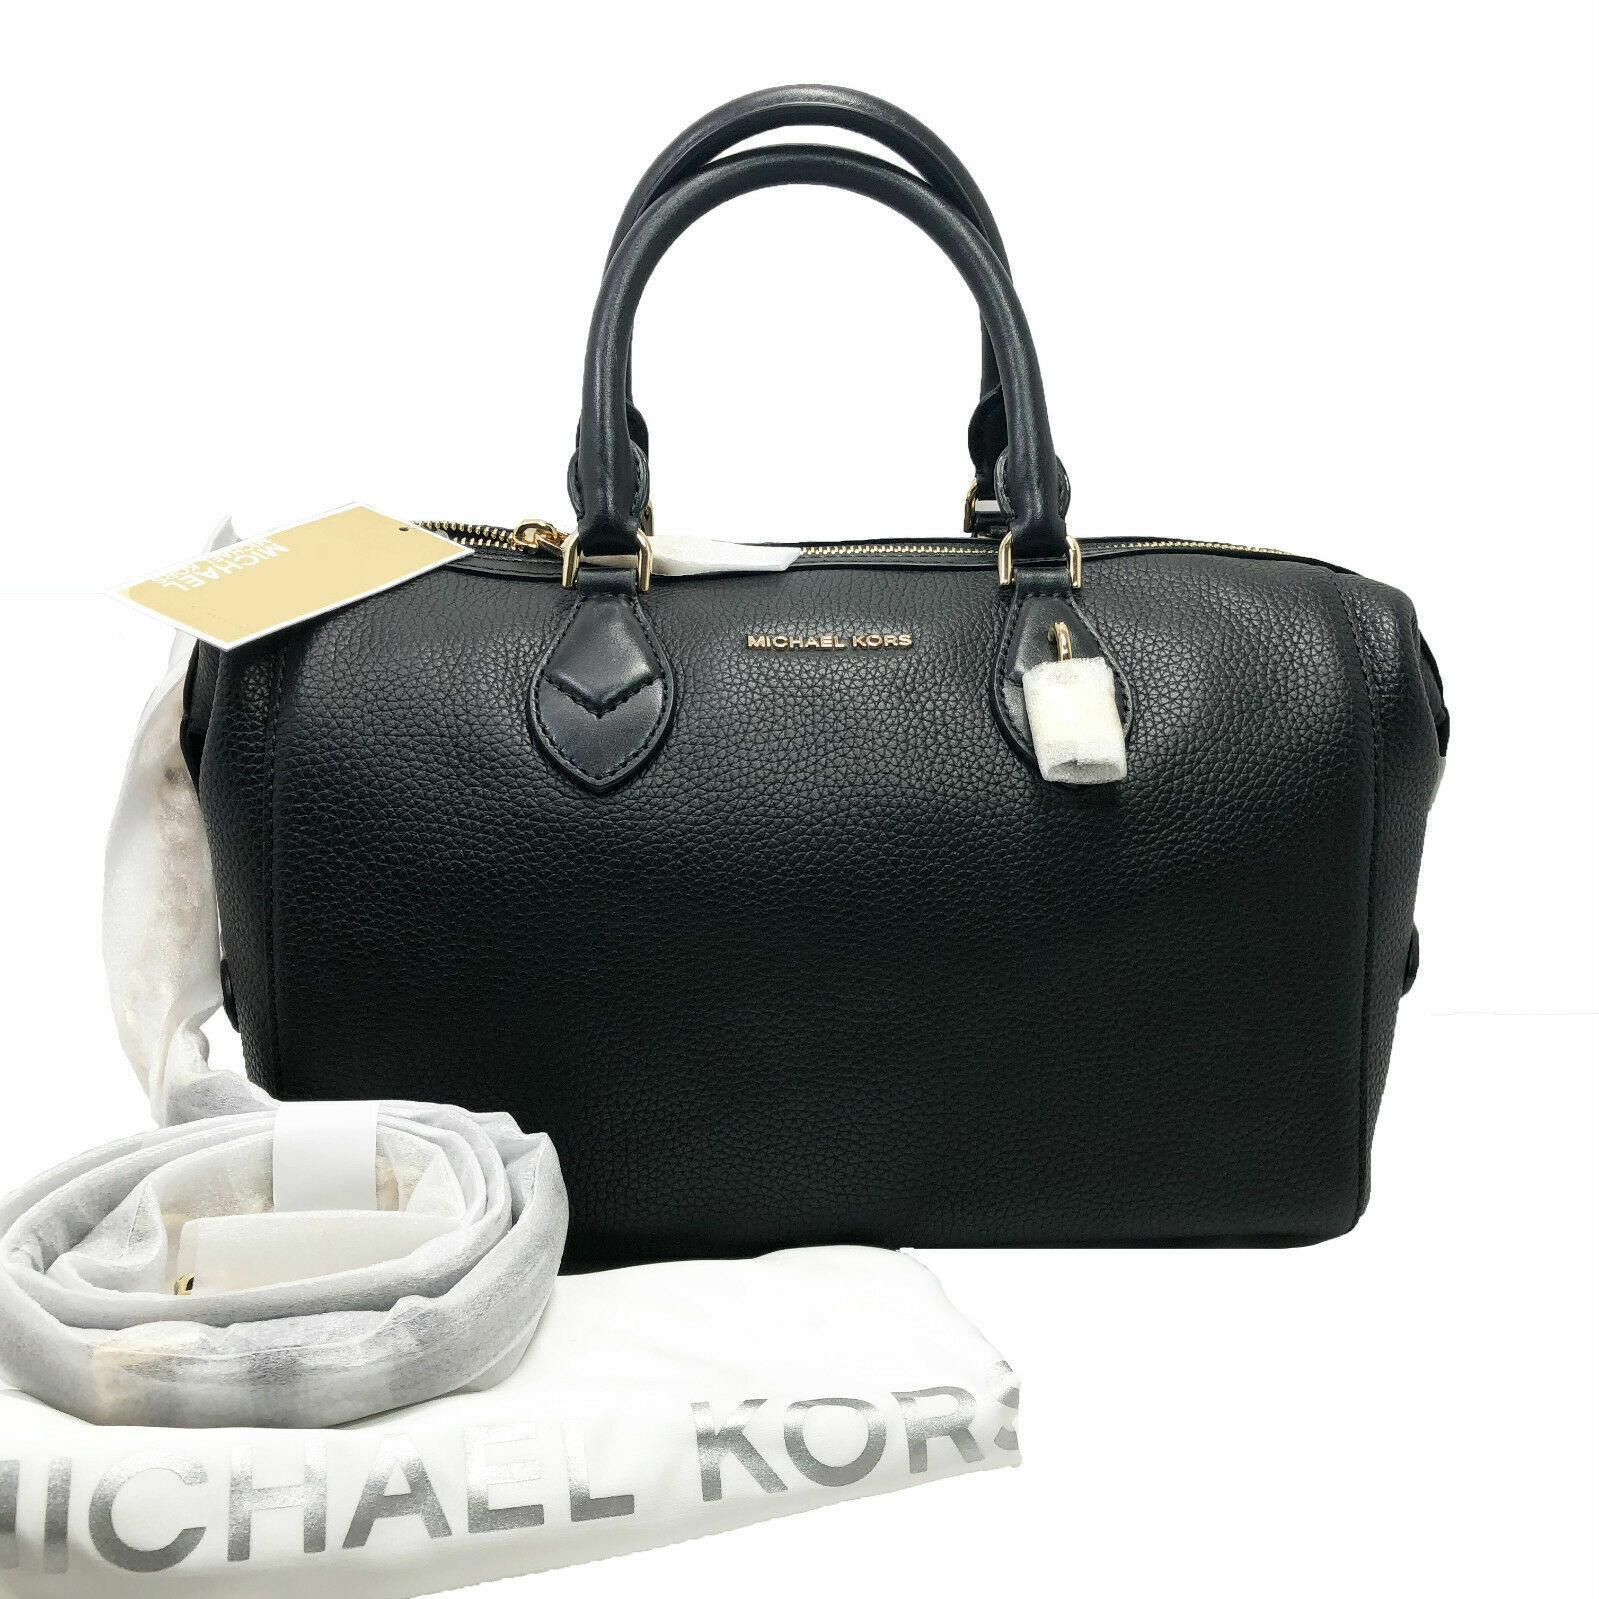 Michael Kors Grayson Large Black Leather Convertible Satchel